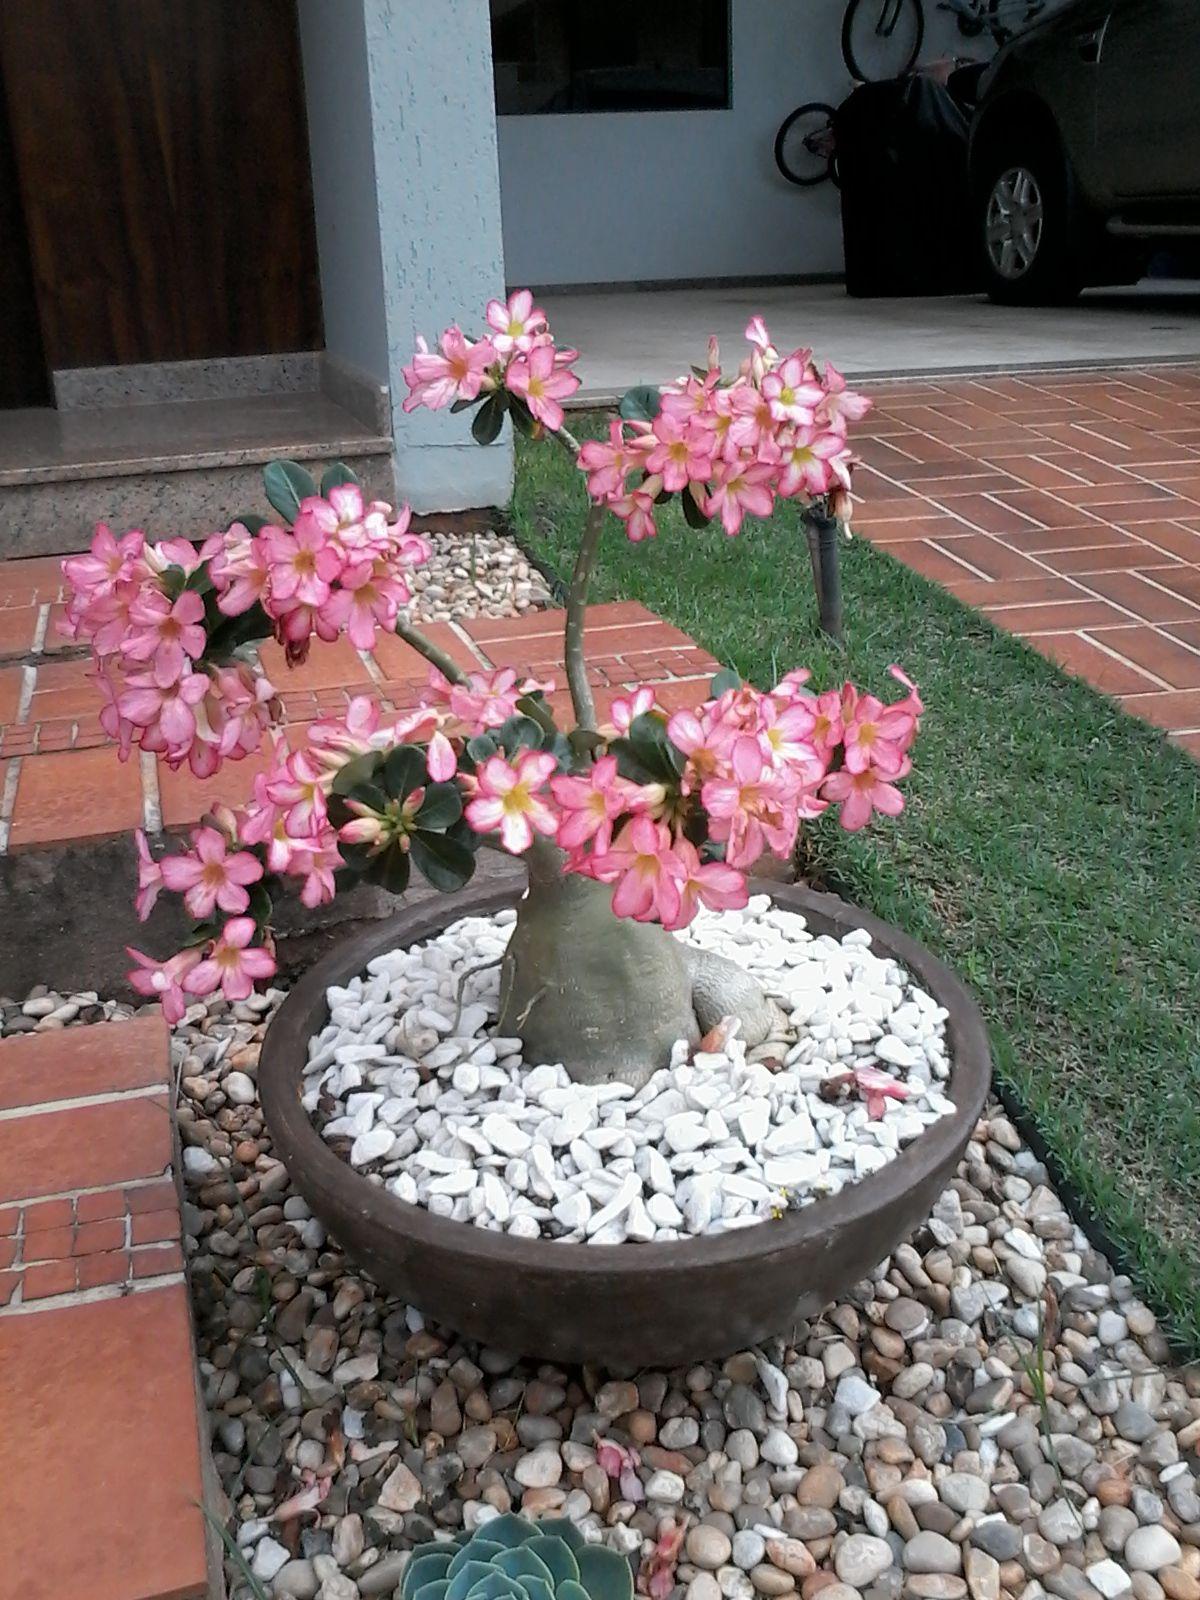 rosa do deserto plants and flowers pinterest. Black Bedroom Furniture Sets. Home Design Ideas